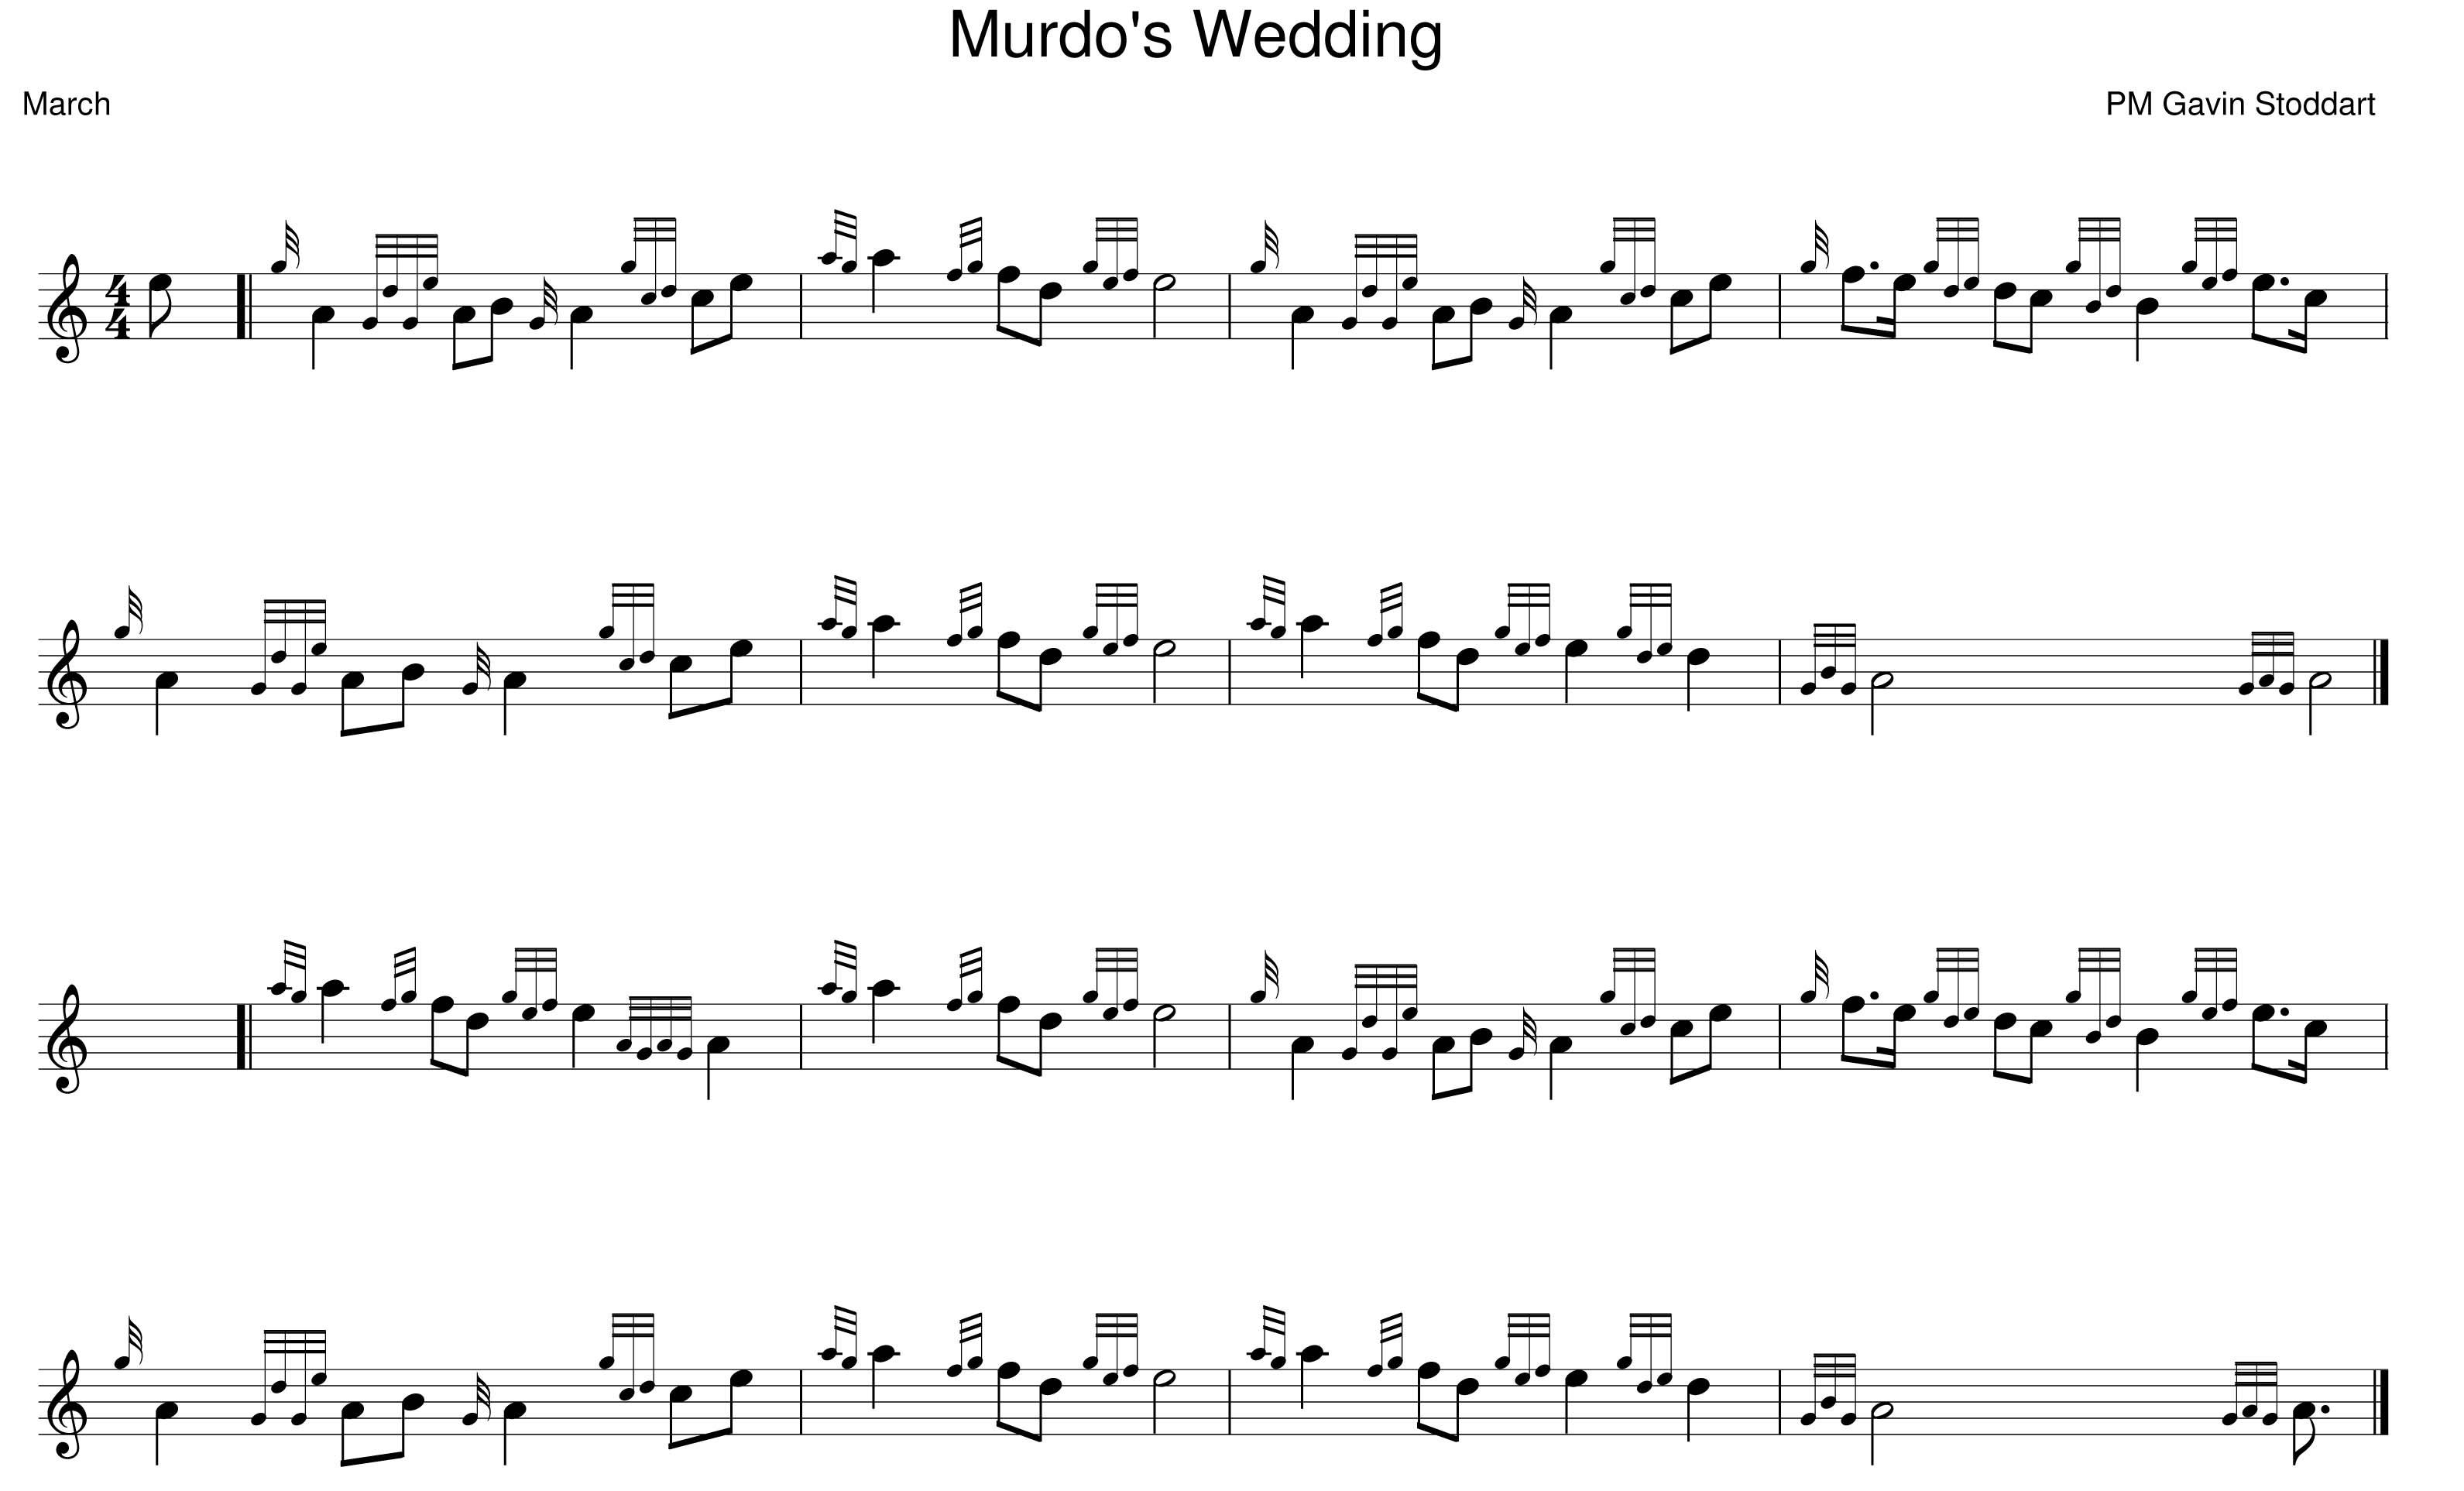 Wedding Tunes For Bagpipes - Unique Wedding Ideas